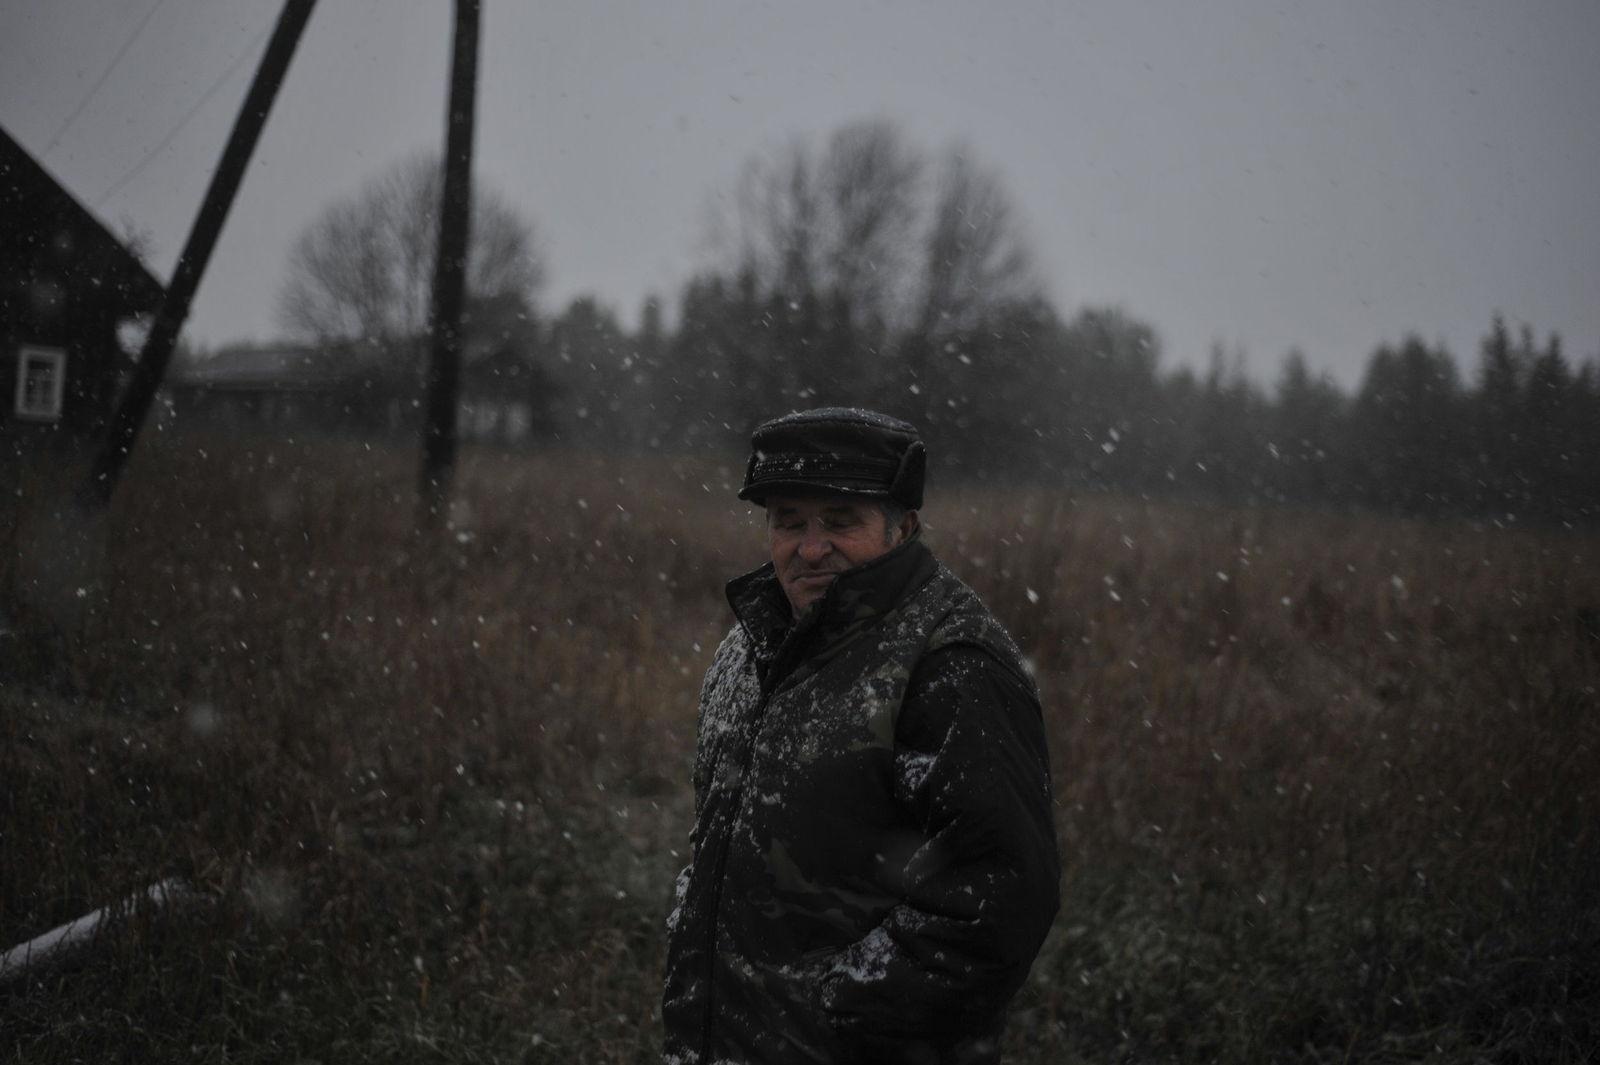 Arik Shraga. Neglected in the village. First snowfall